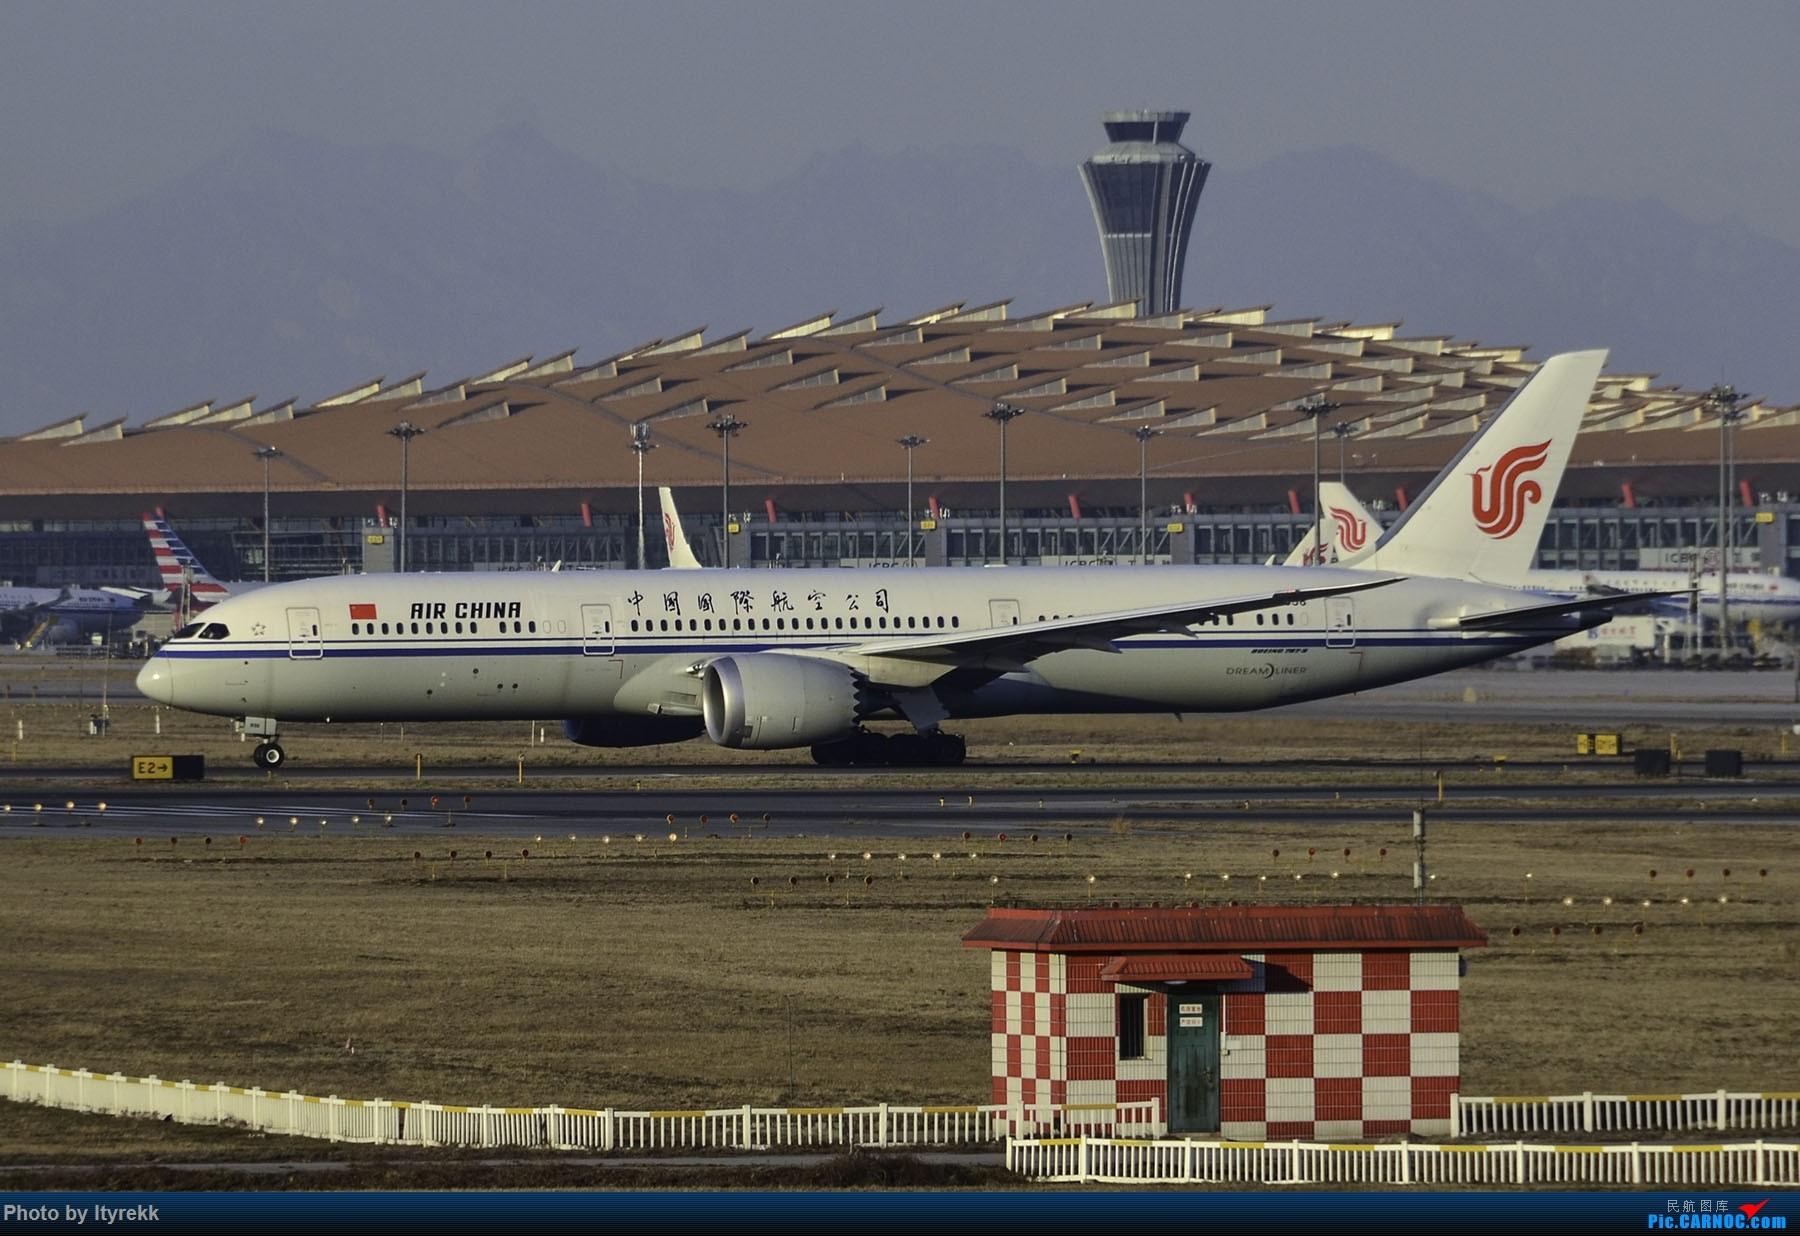 Re:[原创]PEK一日游 收获厦航首架789 B-1566等 BOEING 787-9 B-7898 中国北京首都国际机场